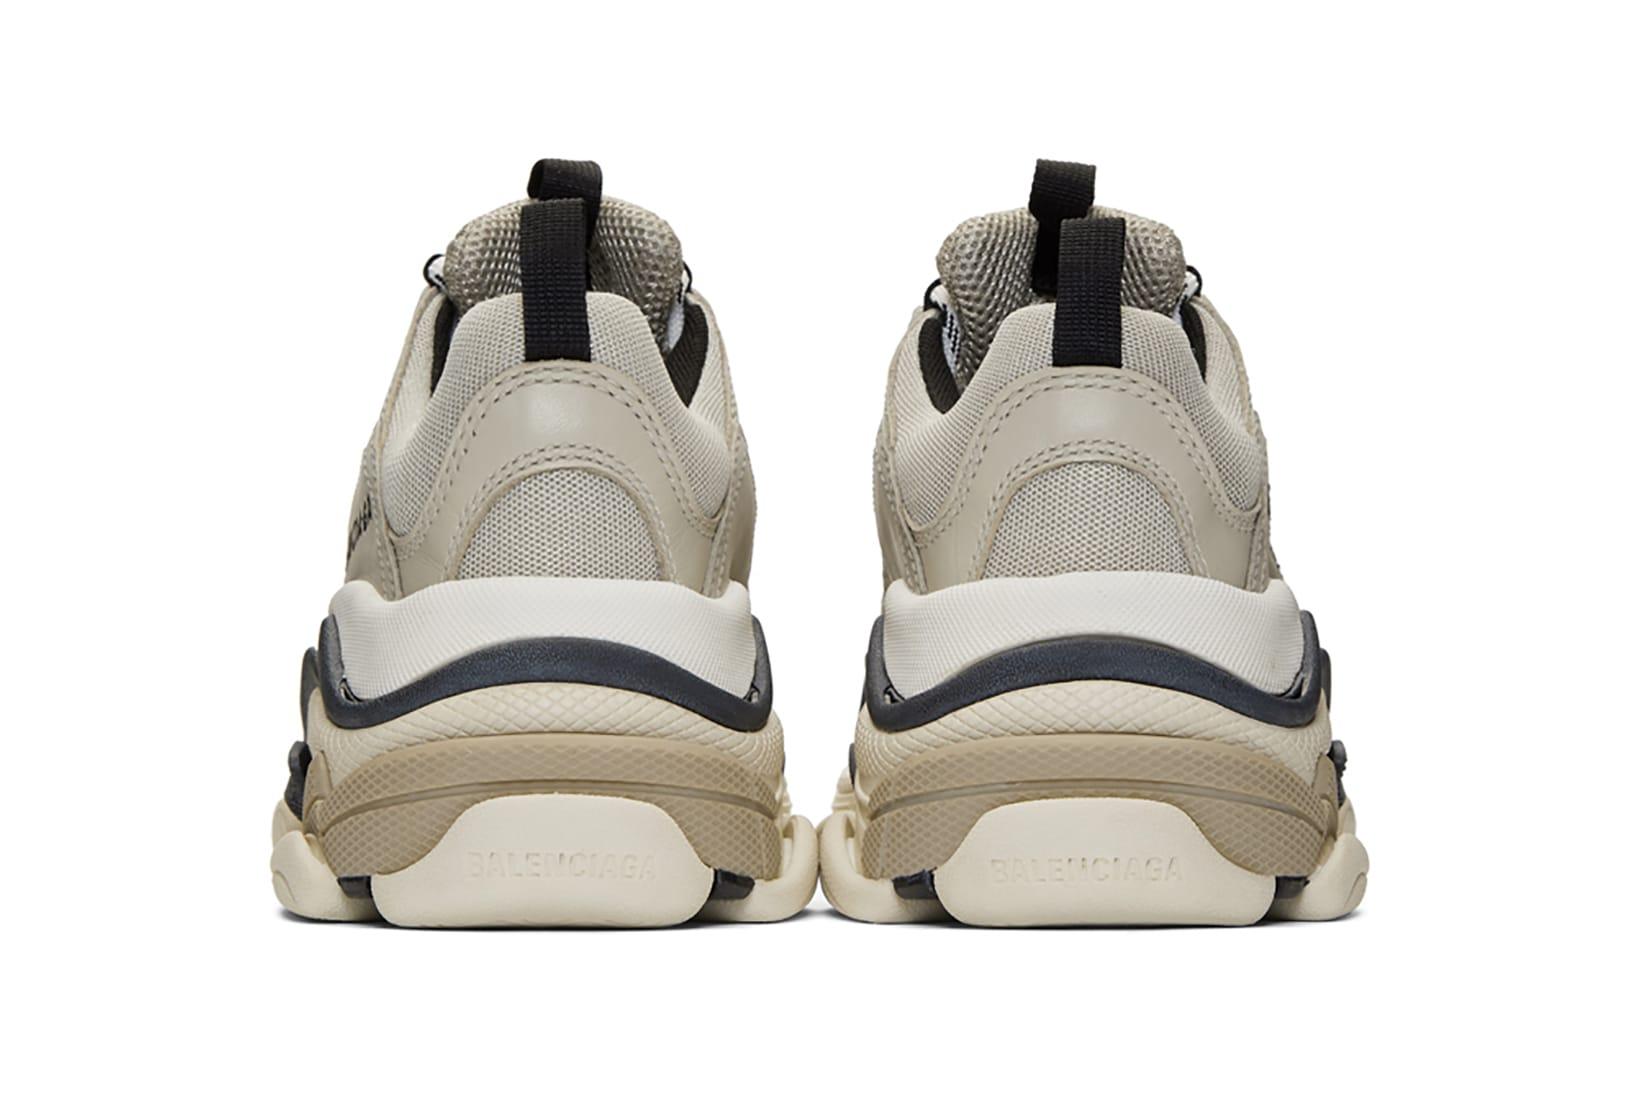 Zapatillas Balenciaga Triple S imitacion Zapatillas para Hombre en